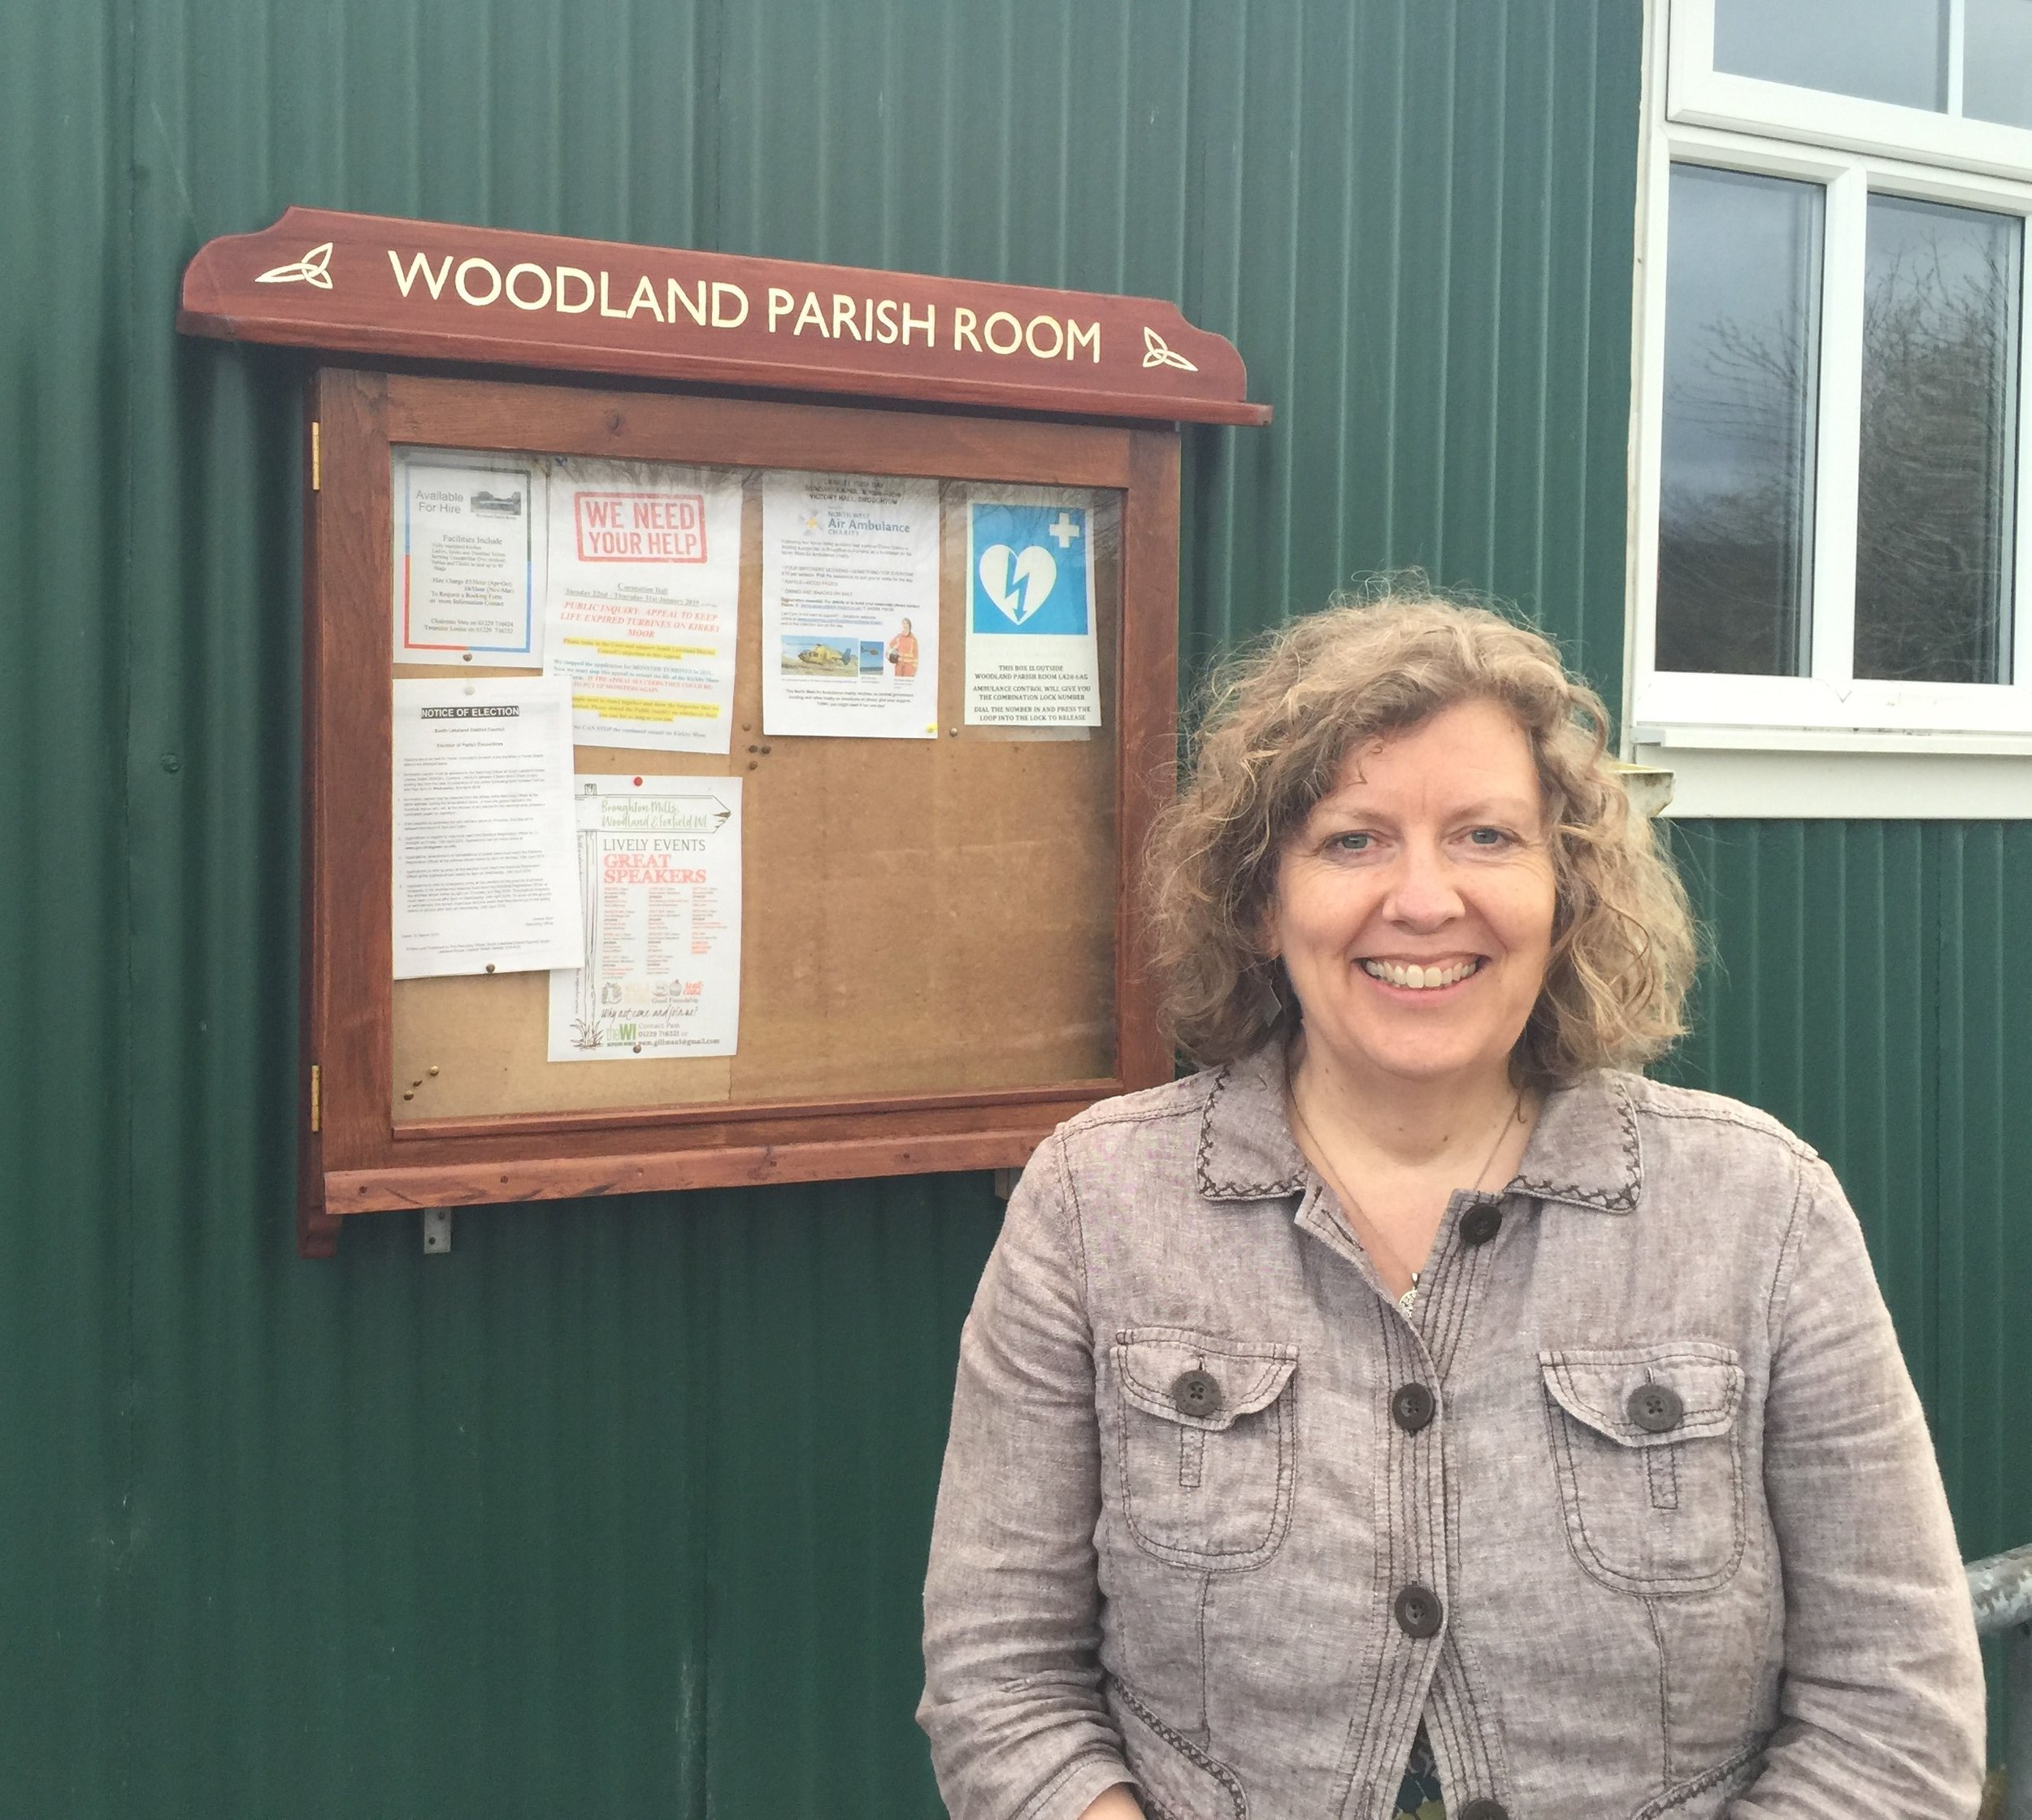 Rachel Wilson outside the Woodland Parish Room.jpg